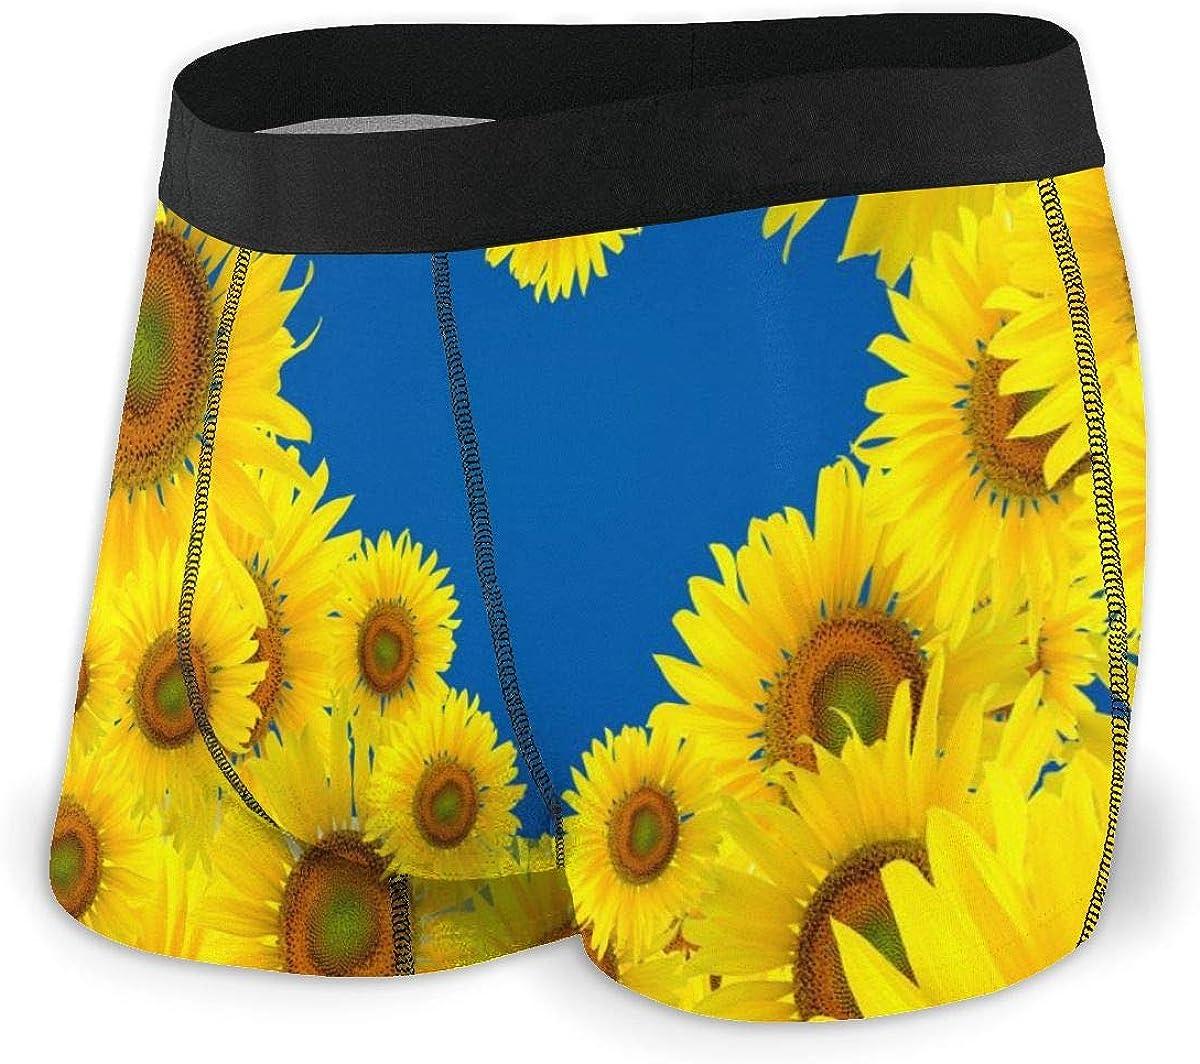 Mens Boxer Briefs Sunshine Love Heart Sunflowers Boys Trunks Underwear Short Leg Breathable Man